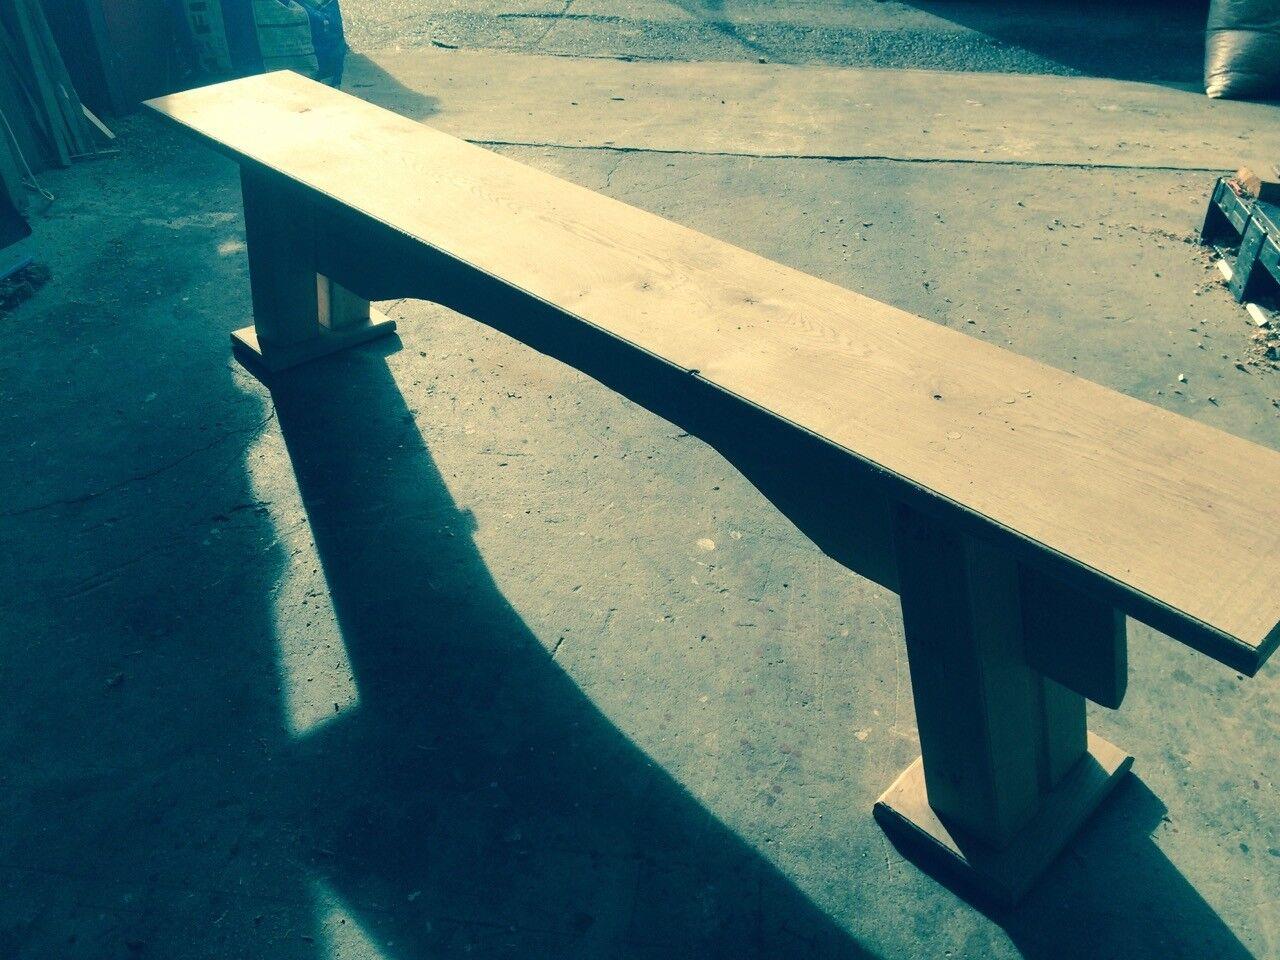 Broadleaf - Boards and furniture